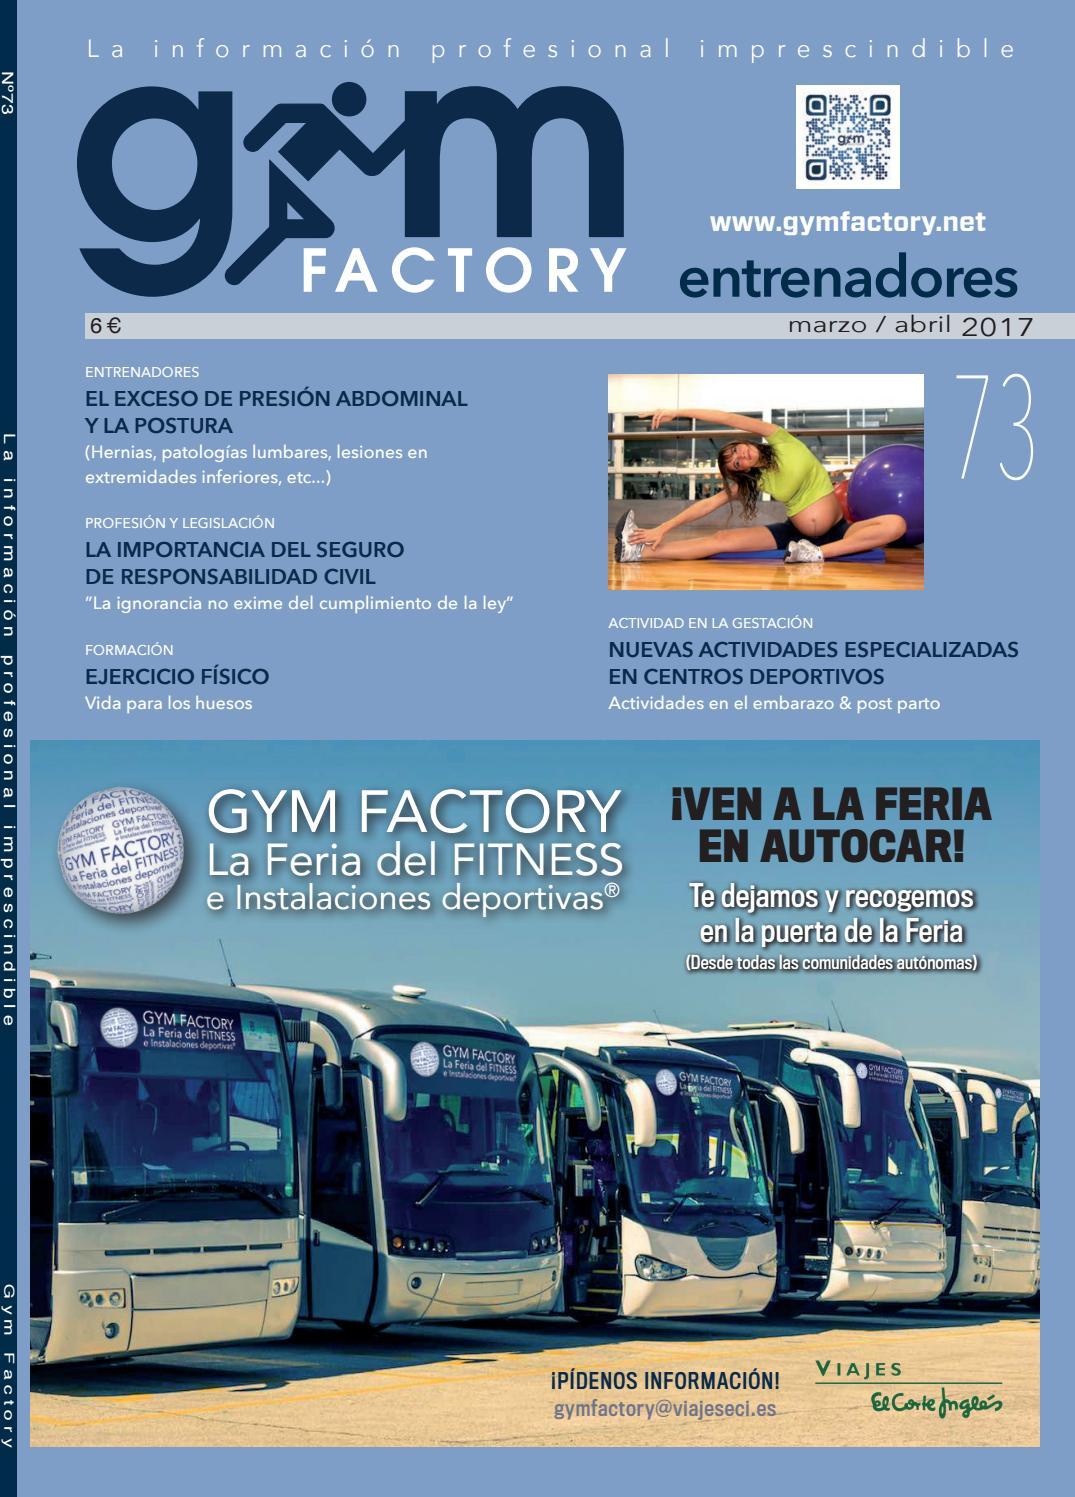 Gym Factory | Entrenadores nº73 by Gym Factory Magazine - issuu